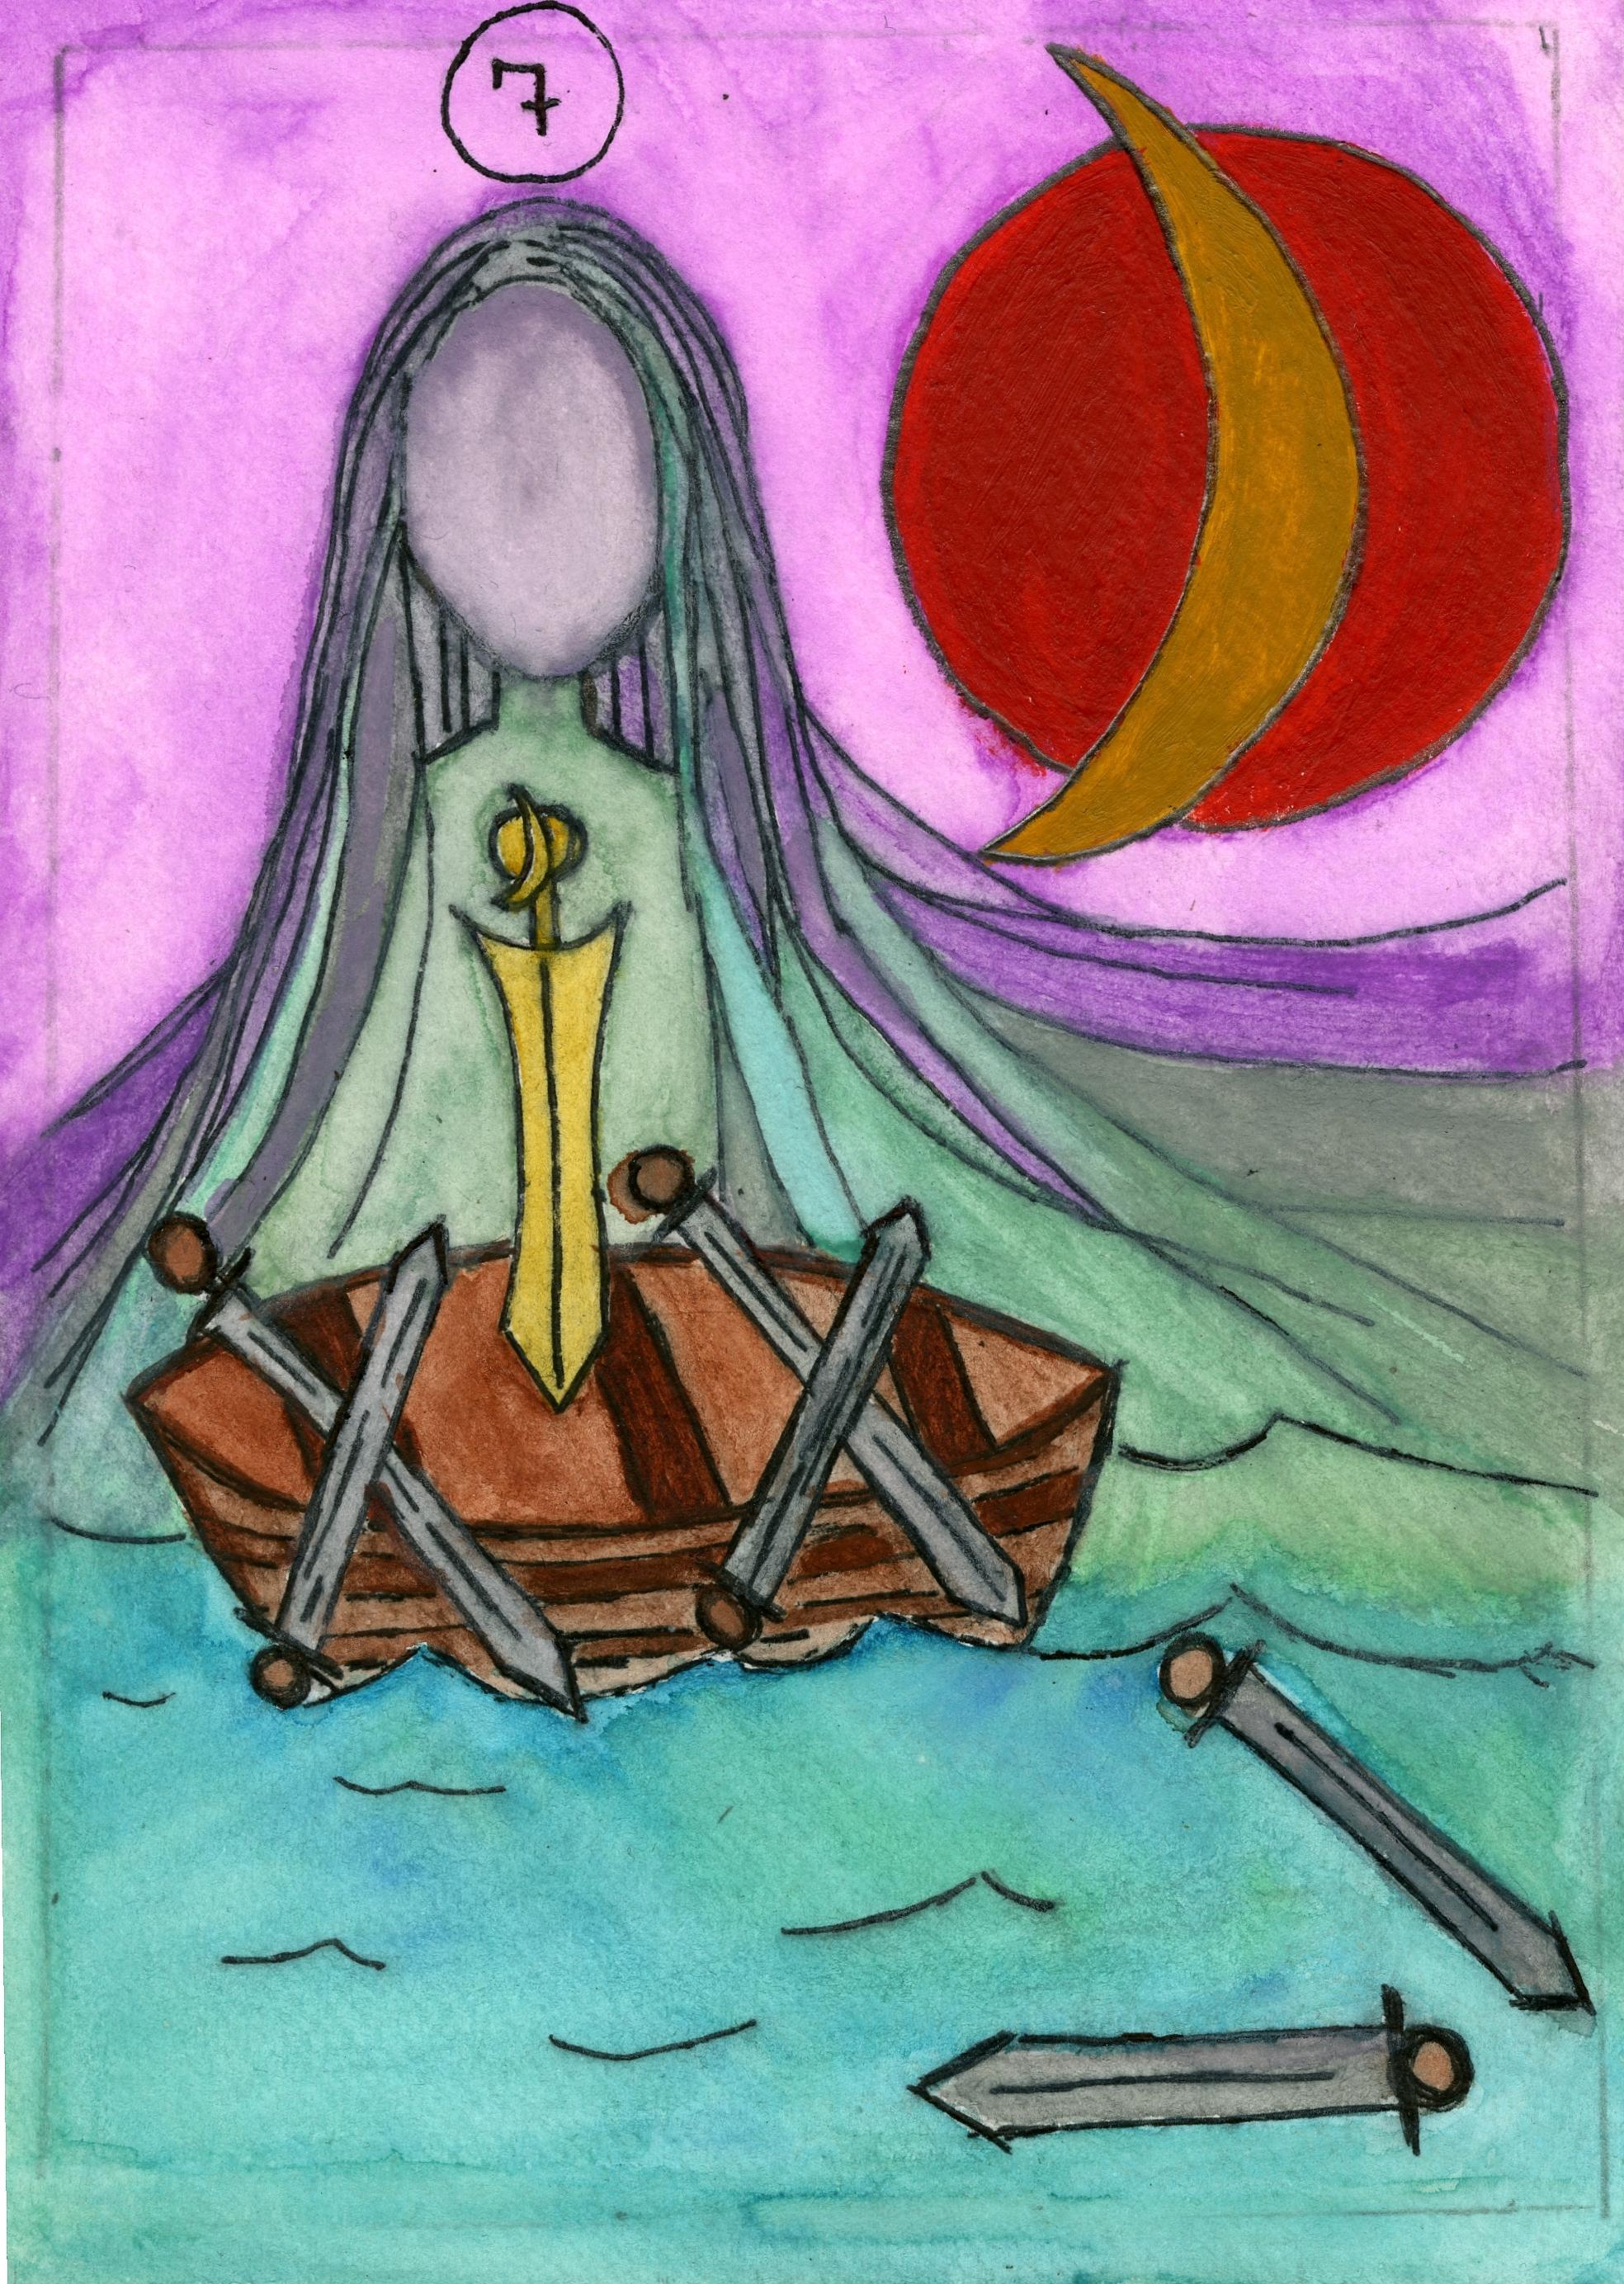 Sara Reddick - Seven of Swords